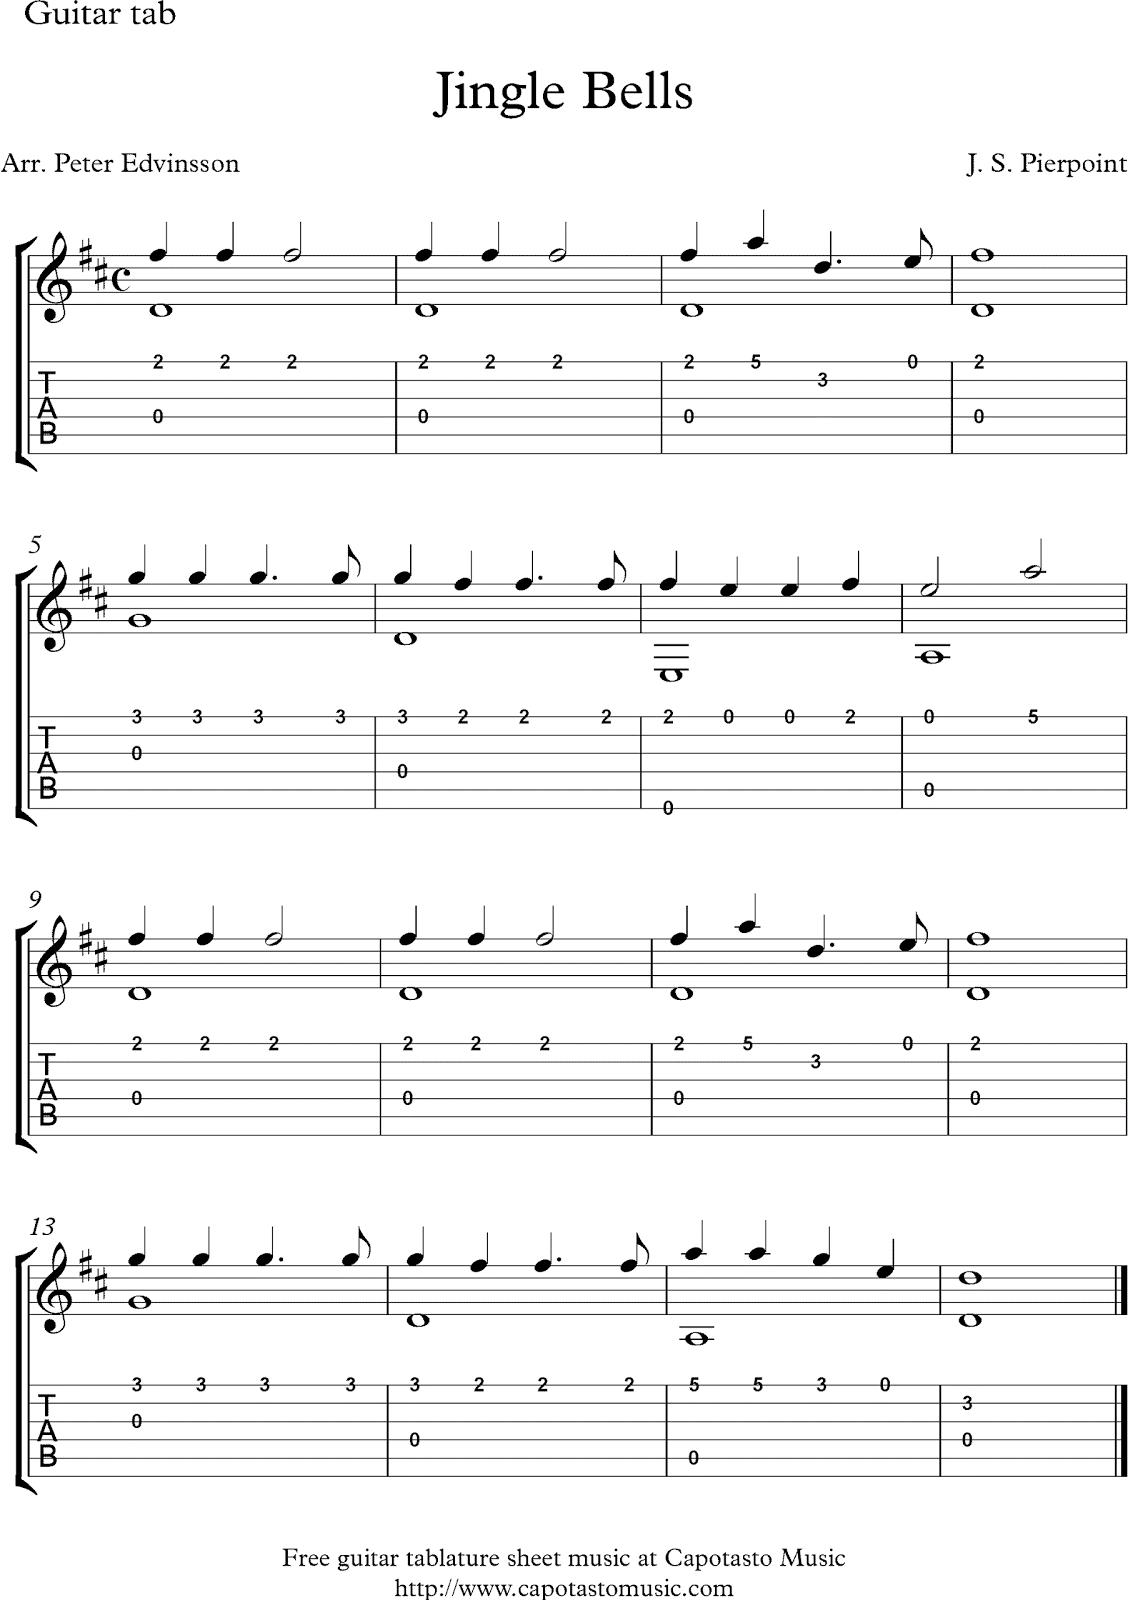 Christmas Guitar Tabs.Music Play To Find Jingle Bells Free Christmas Guitar Tab